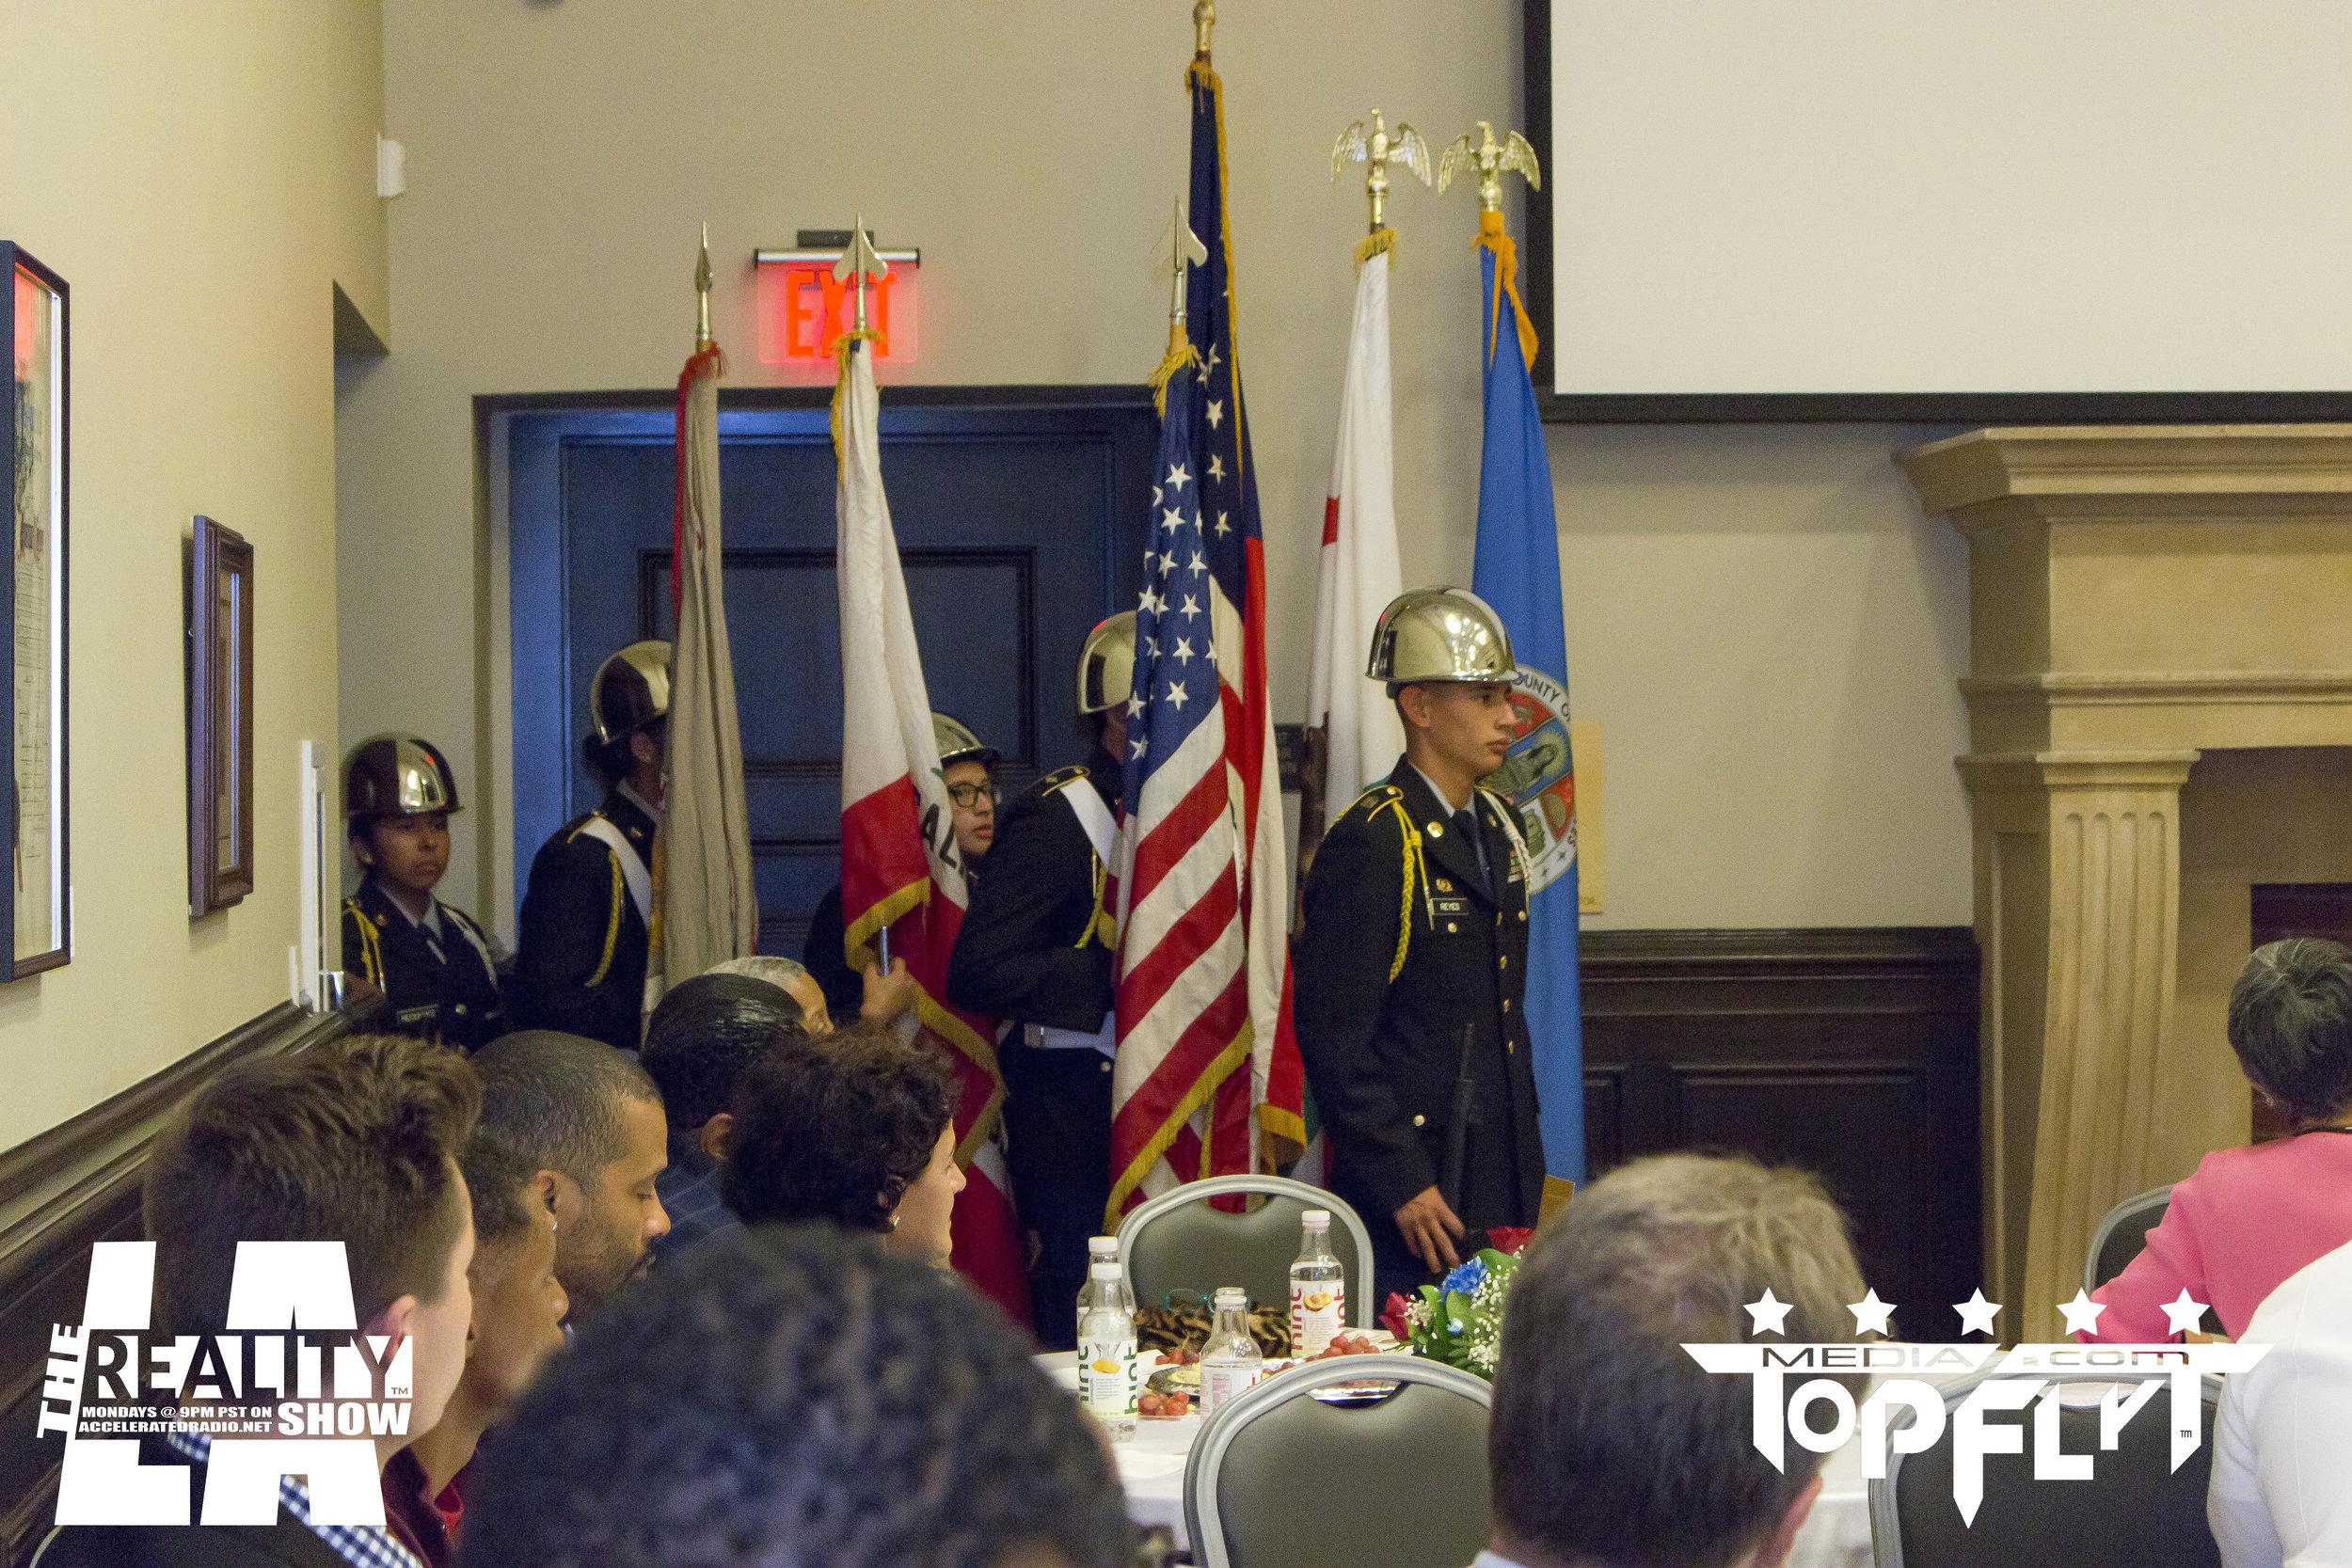 The Reality Show LA - Tuskegee Airmen 75th Anniversary VIP Reception_83.jpg